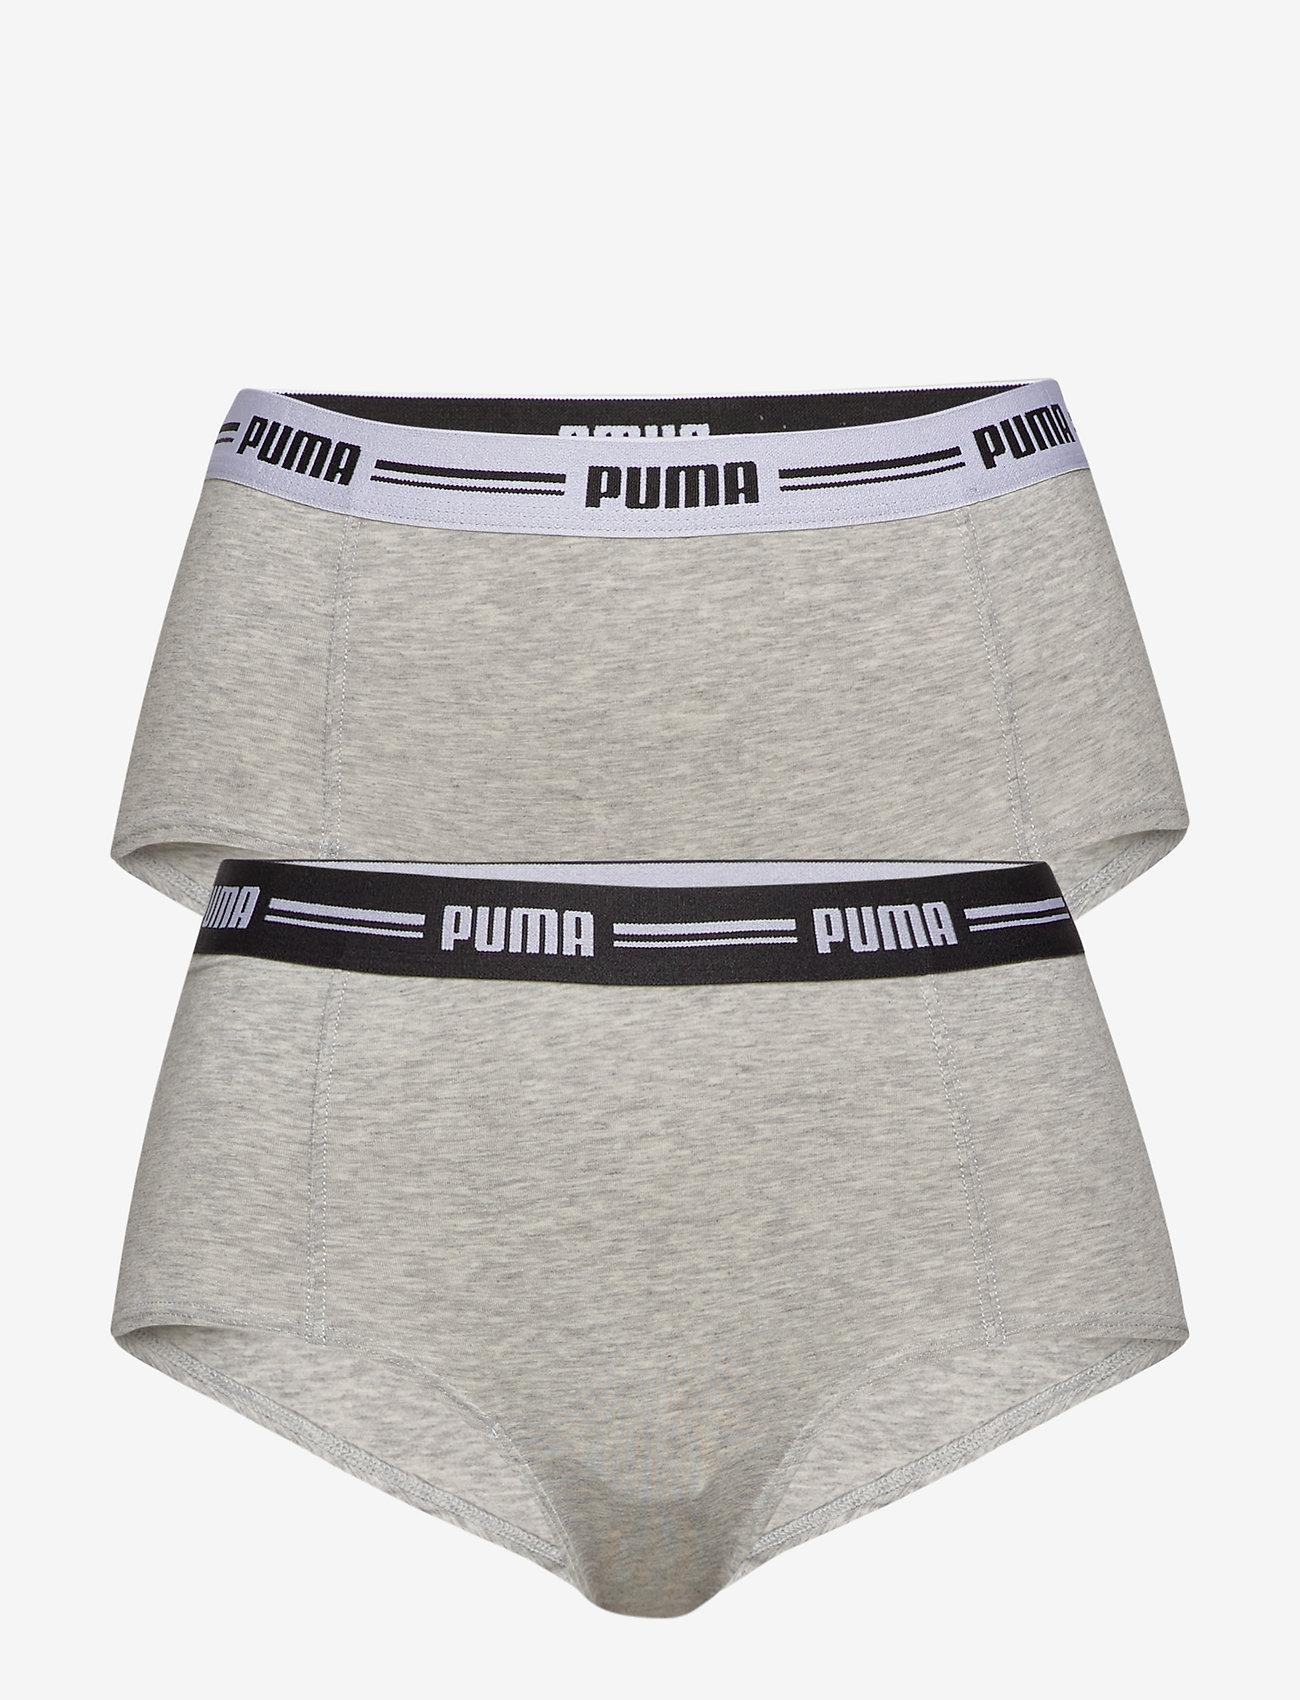 PUMA - PUMA ICONIC MINI SHORT 2P HANG - broekjes - grey / grey - 0